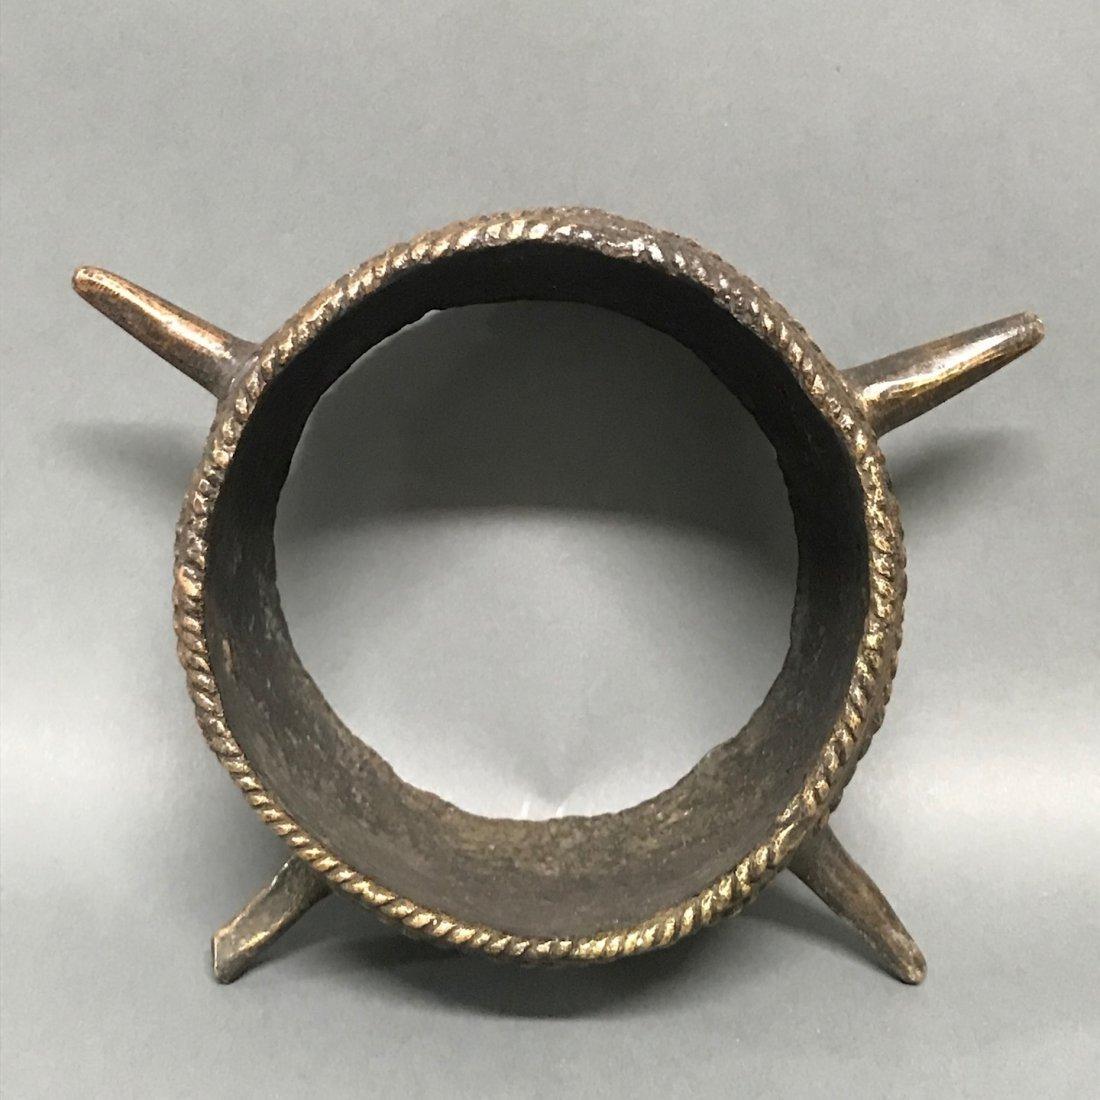 Nigerian Bronze Currency Bracelet - 5